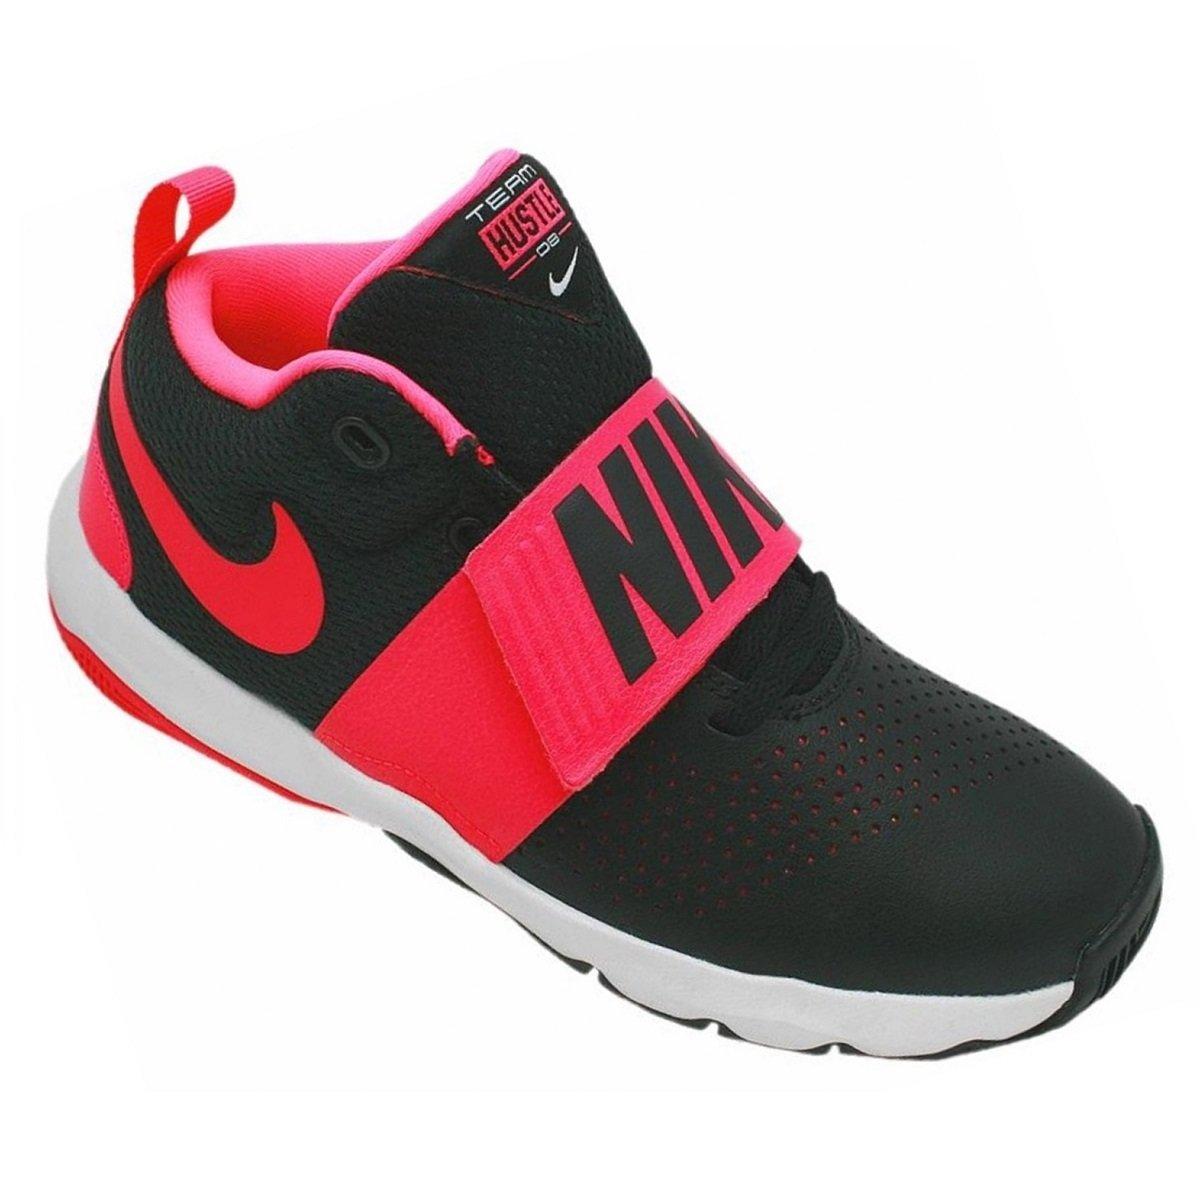 798db4ab Tênis Infantil Nike Team Hustle D 8 881941-002 - Preto/Pink - Botas ...